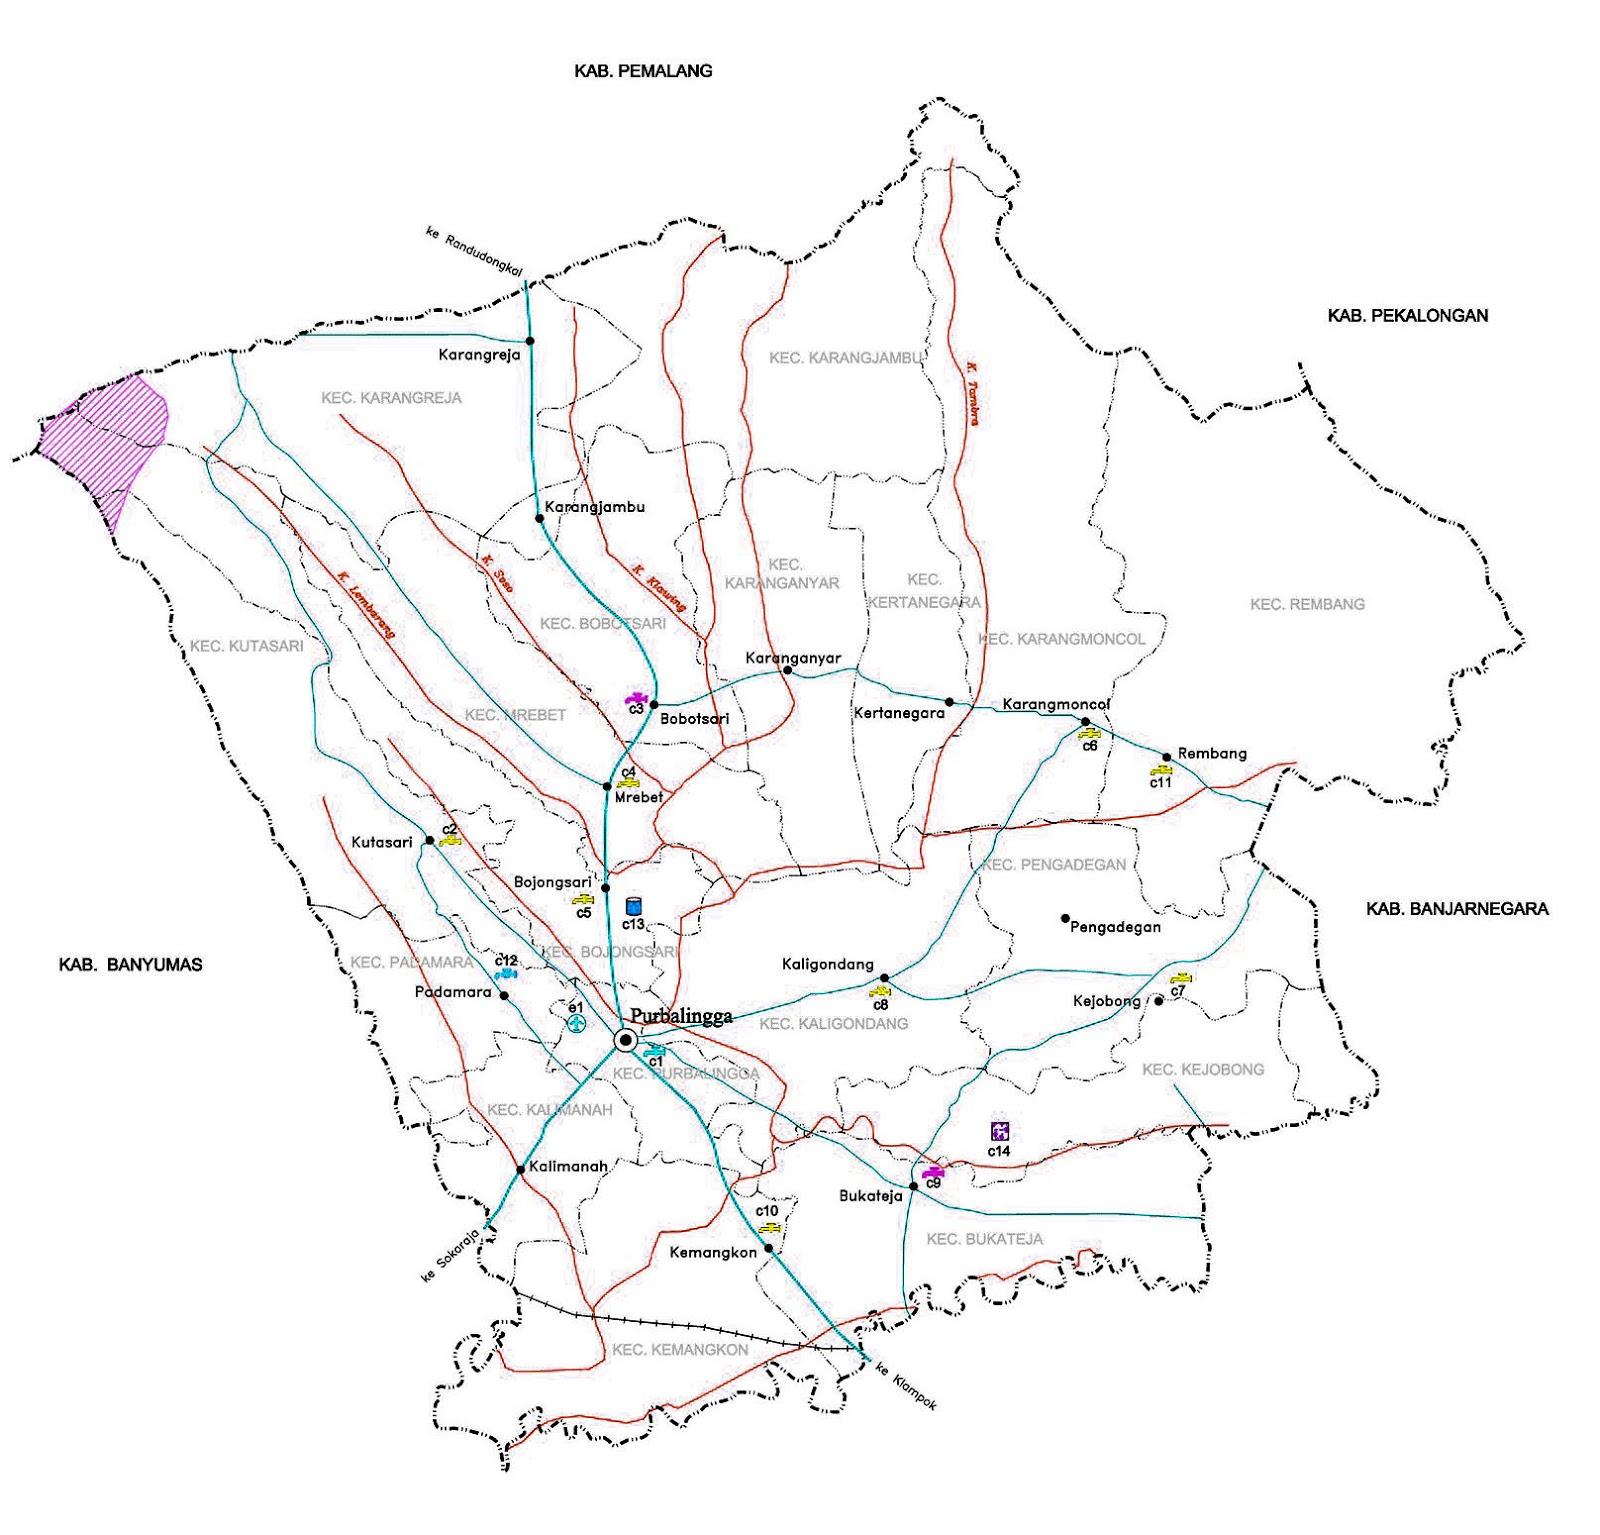 Gambar Peta infrastruktur Kabupaten Purbalingga